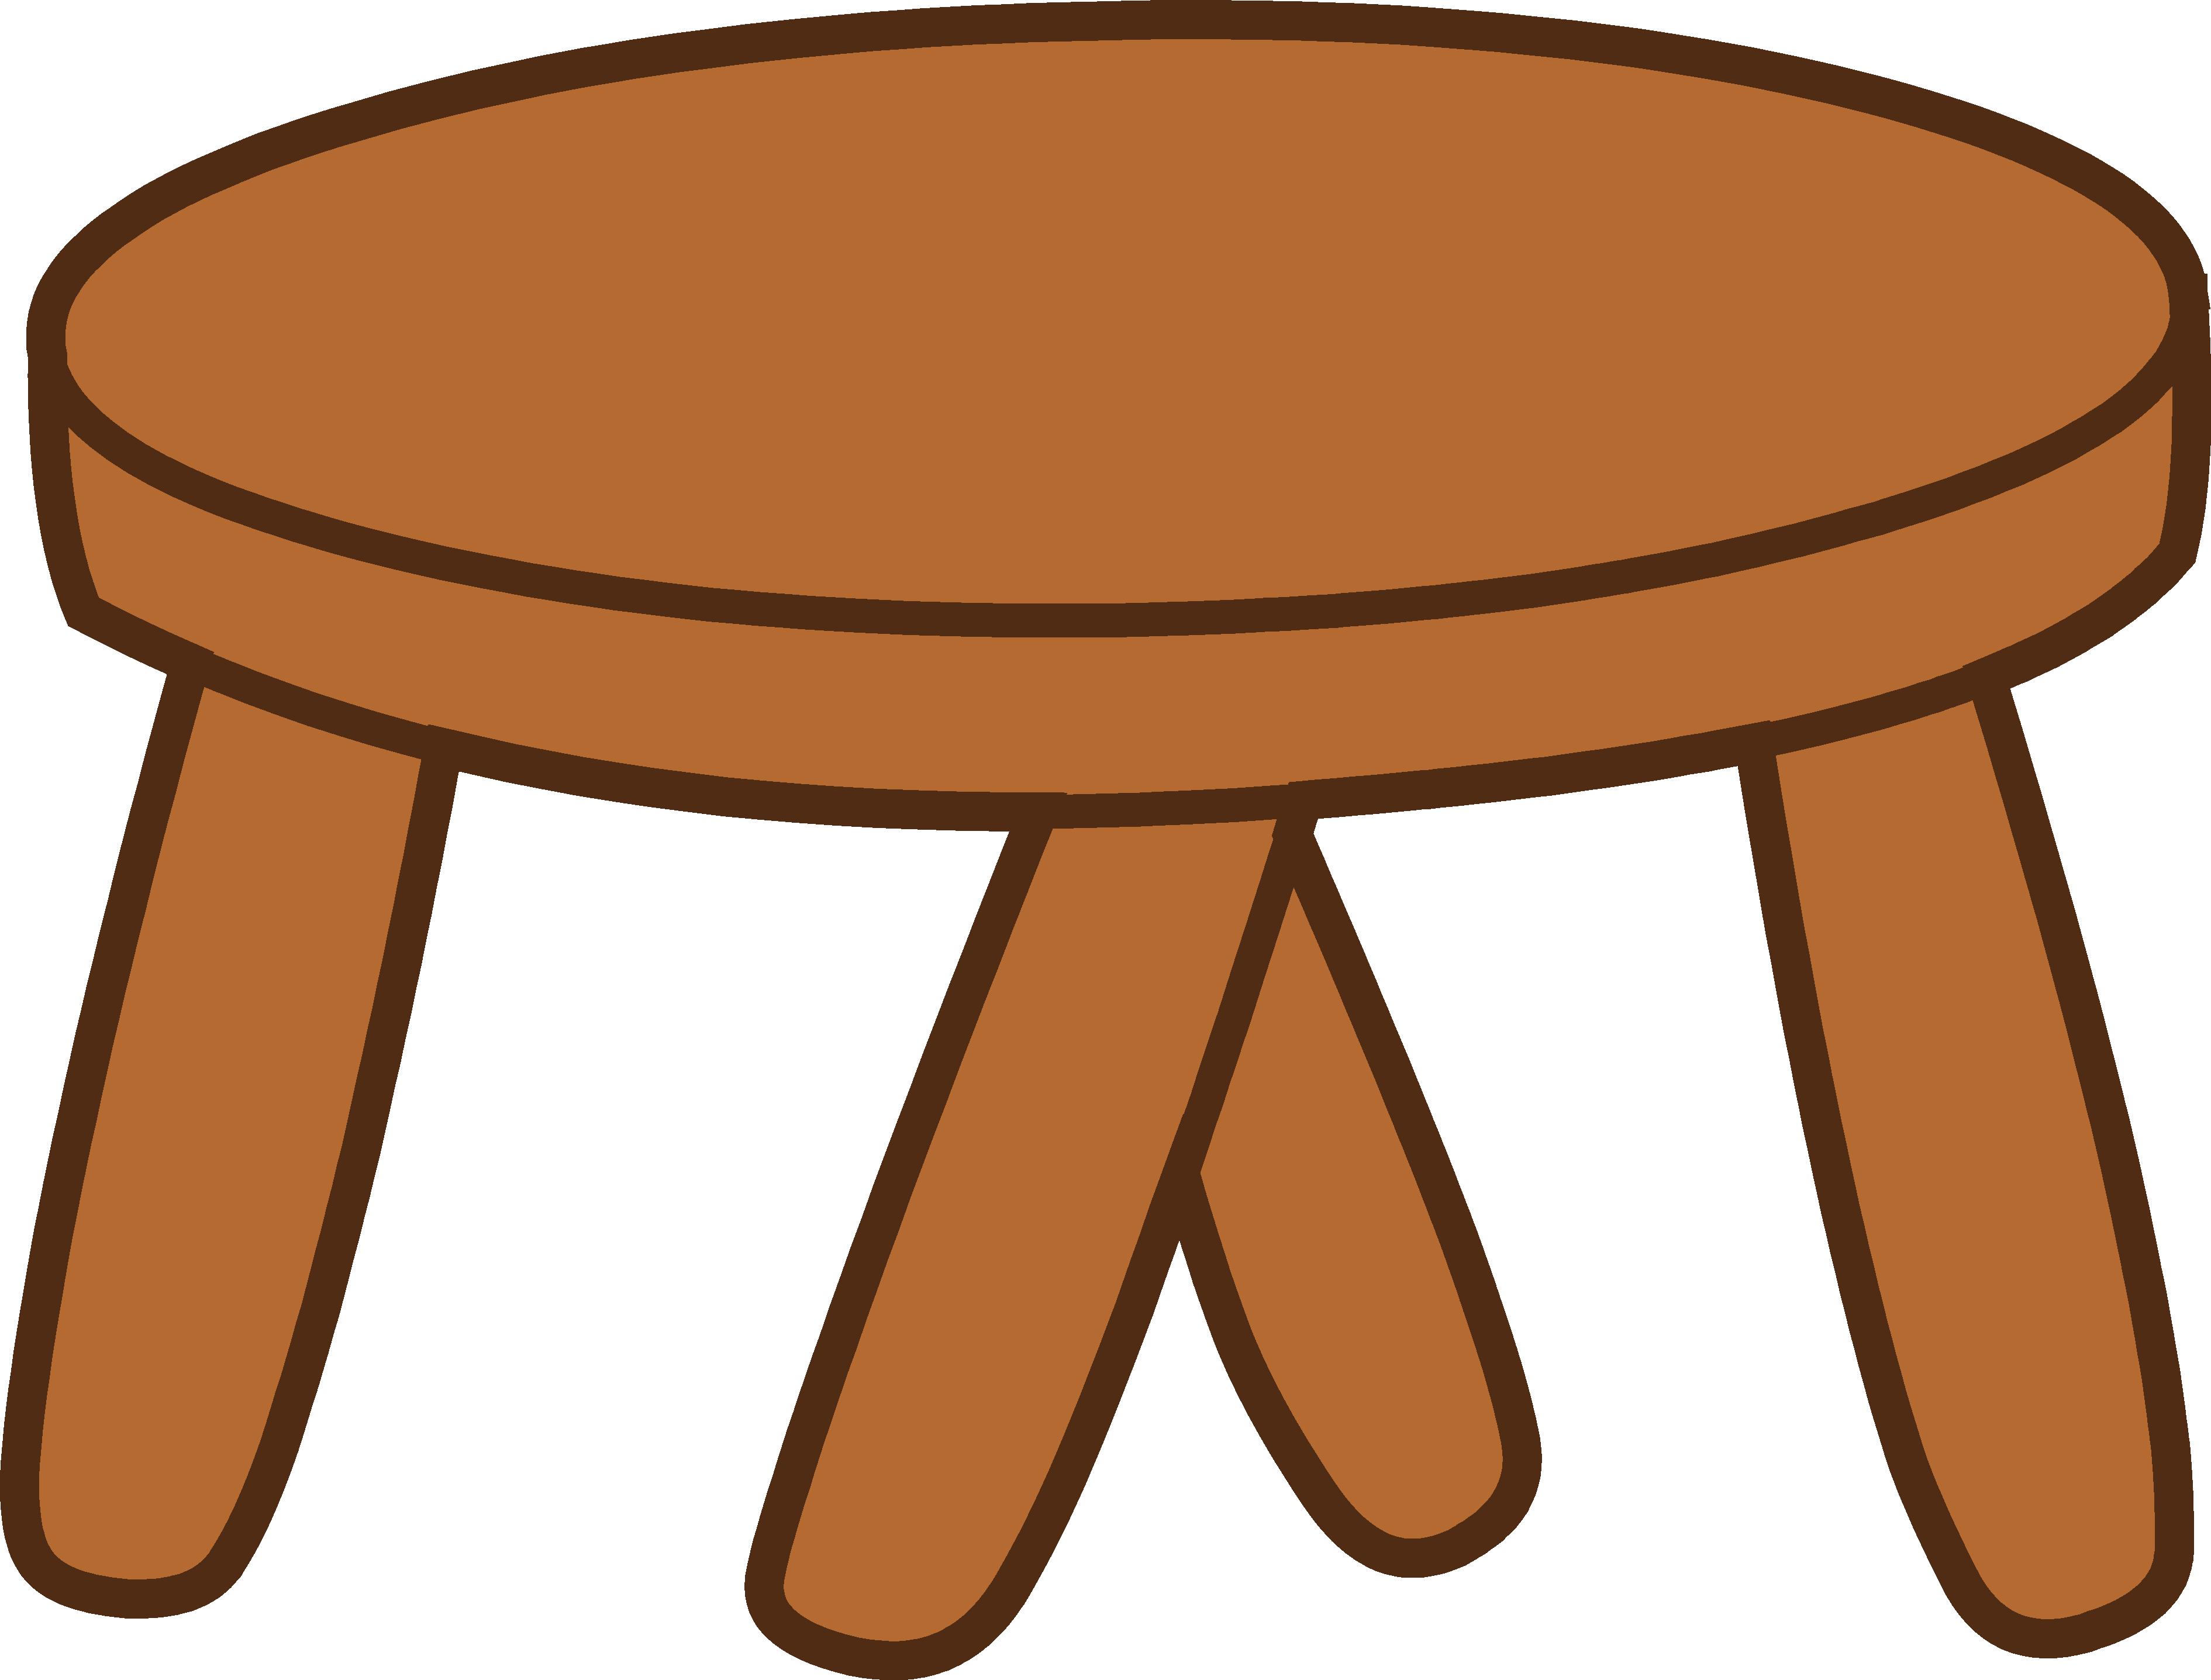 Furniture clipart animated. Footstool